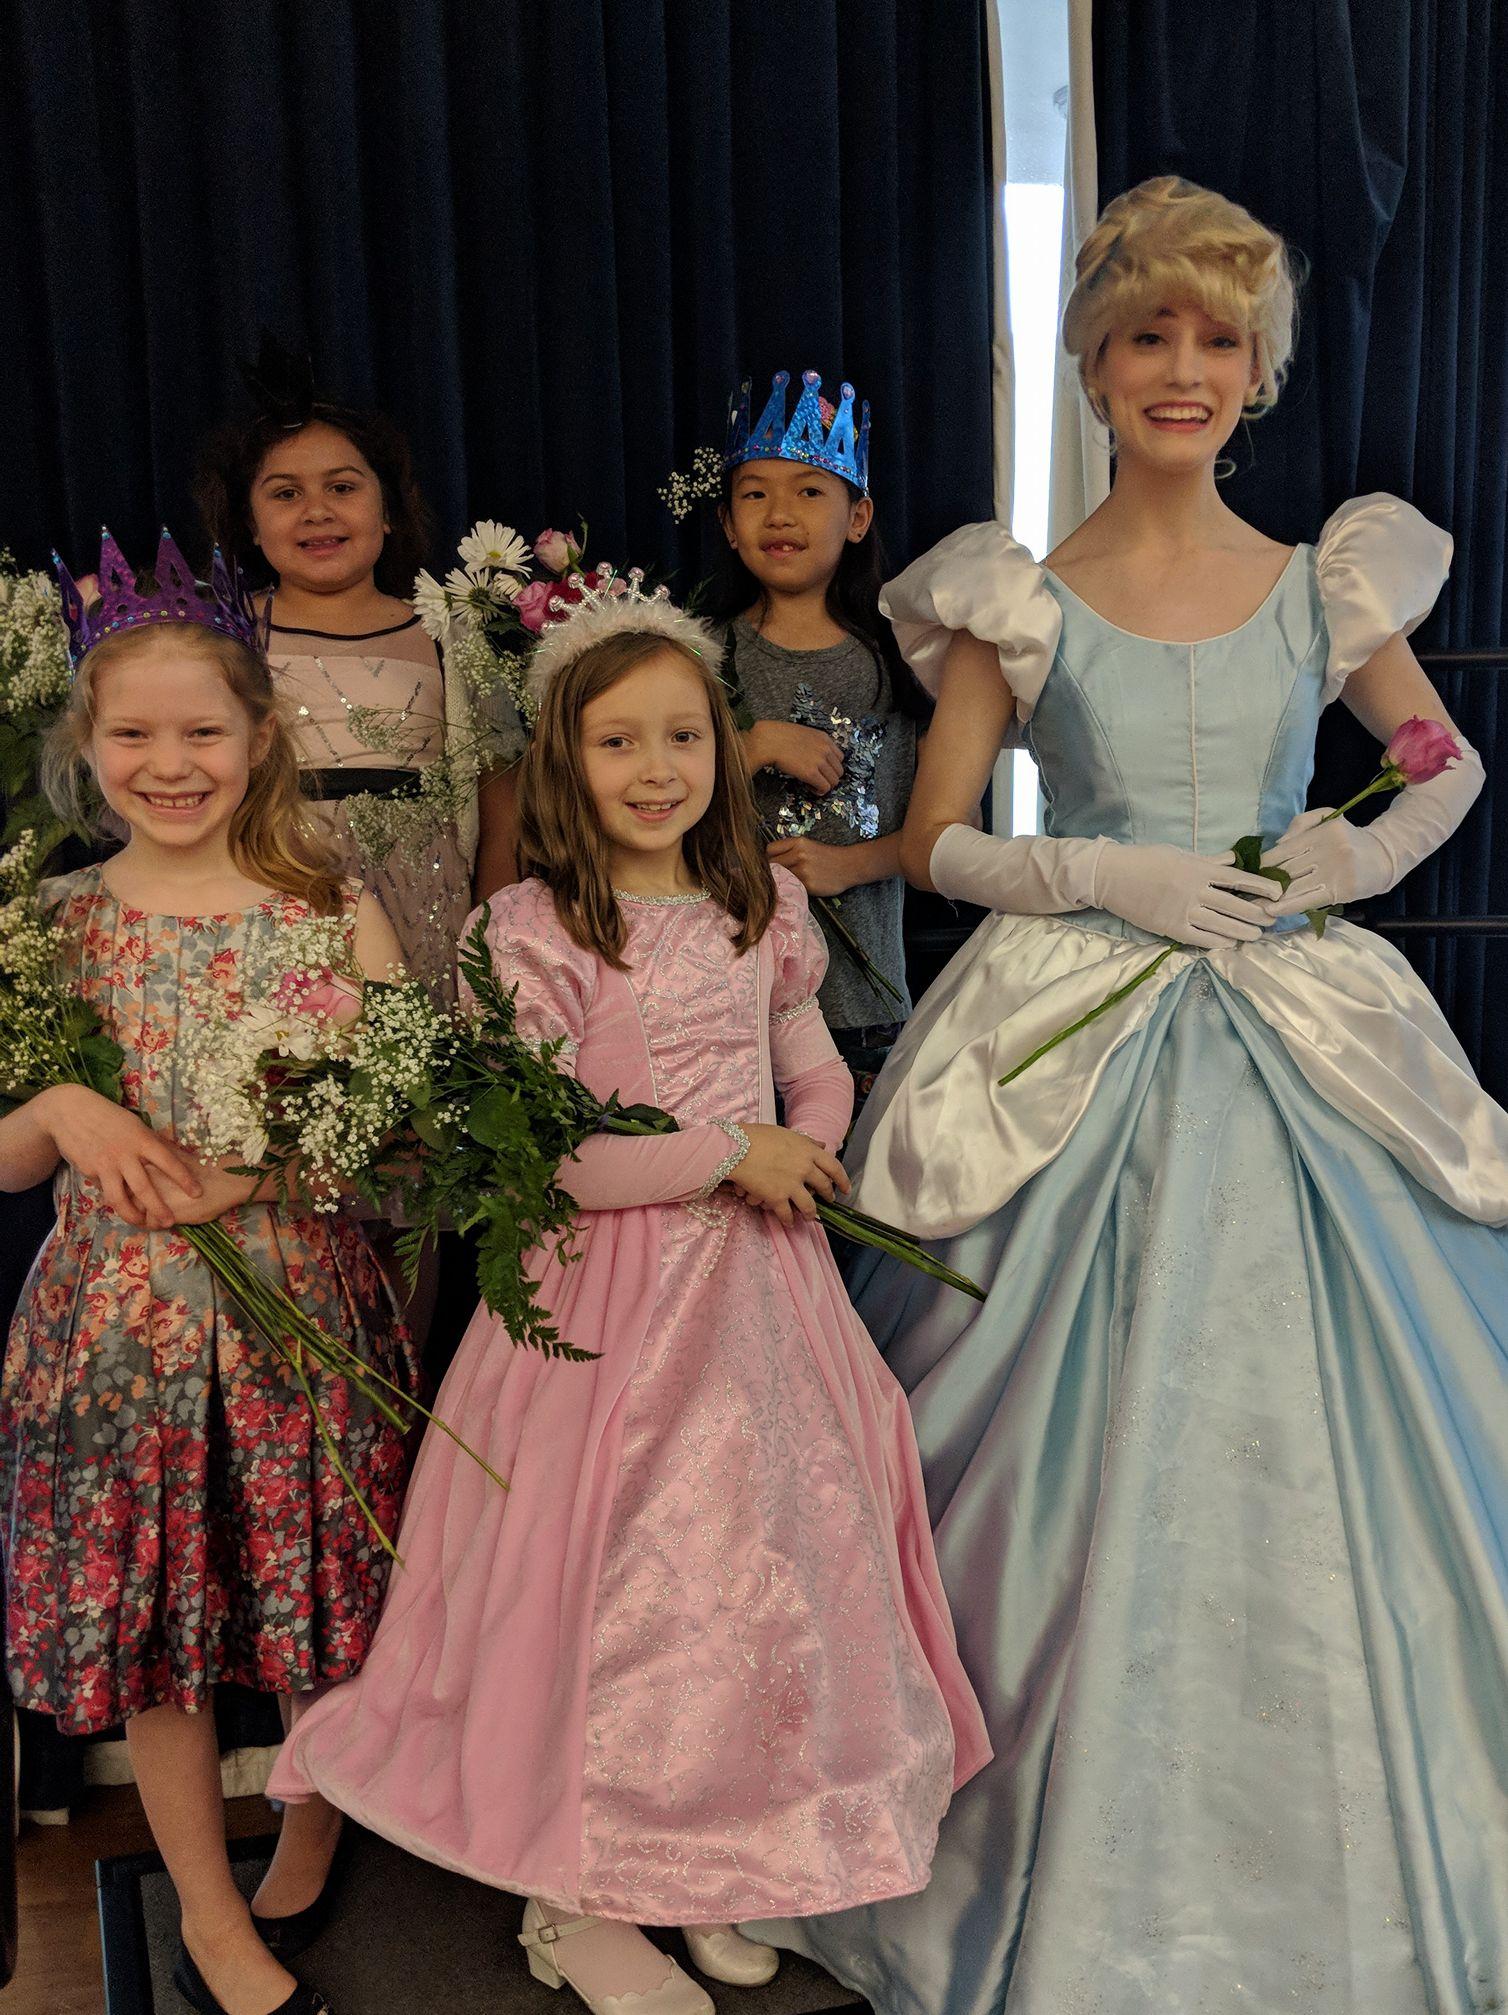 Children at The British International School of New York made their celebration a truly royal affair!